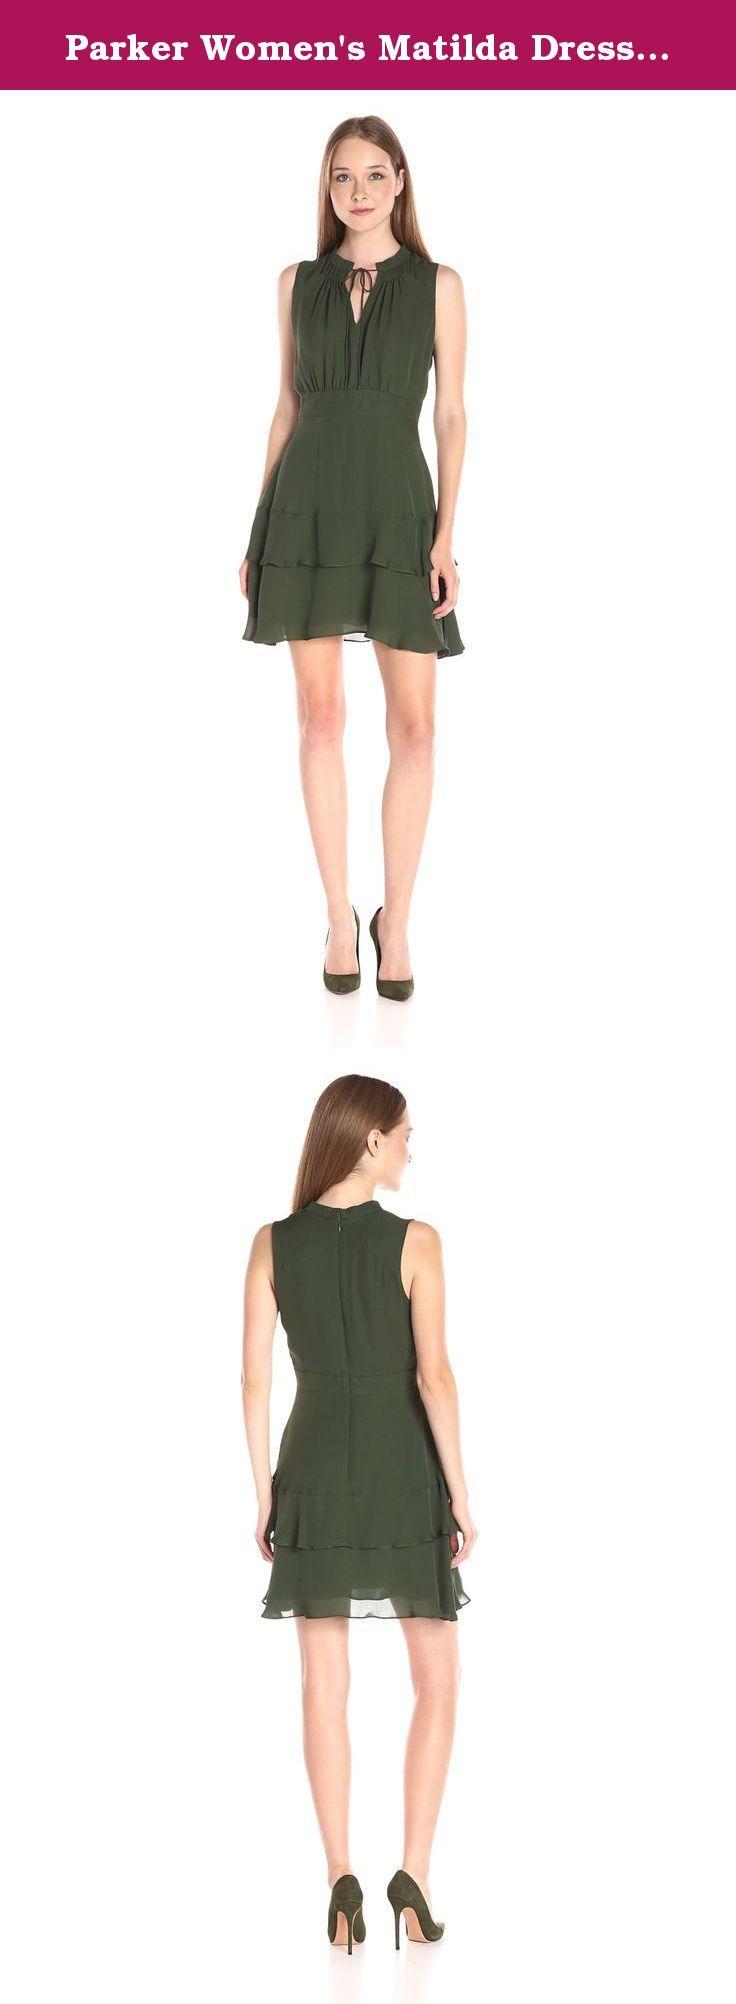 Parker Women's Matilda Dress, Sage, Small. Sleeveless tiered dress with tie neck detail. Side zipper closure. 100 percent silk.